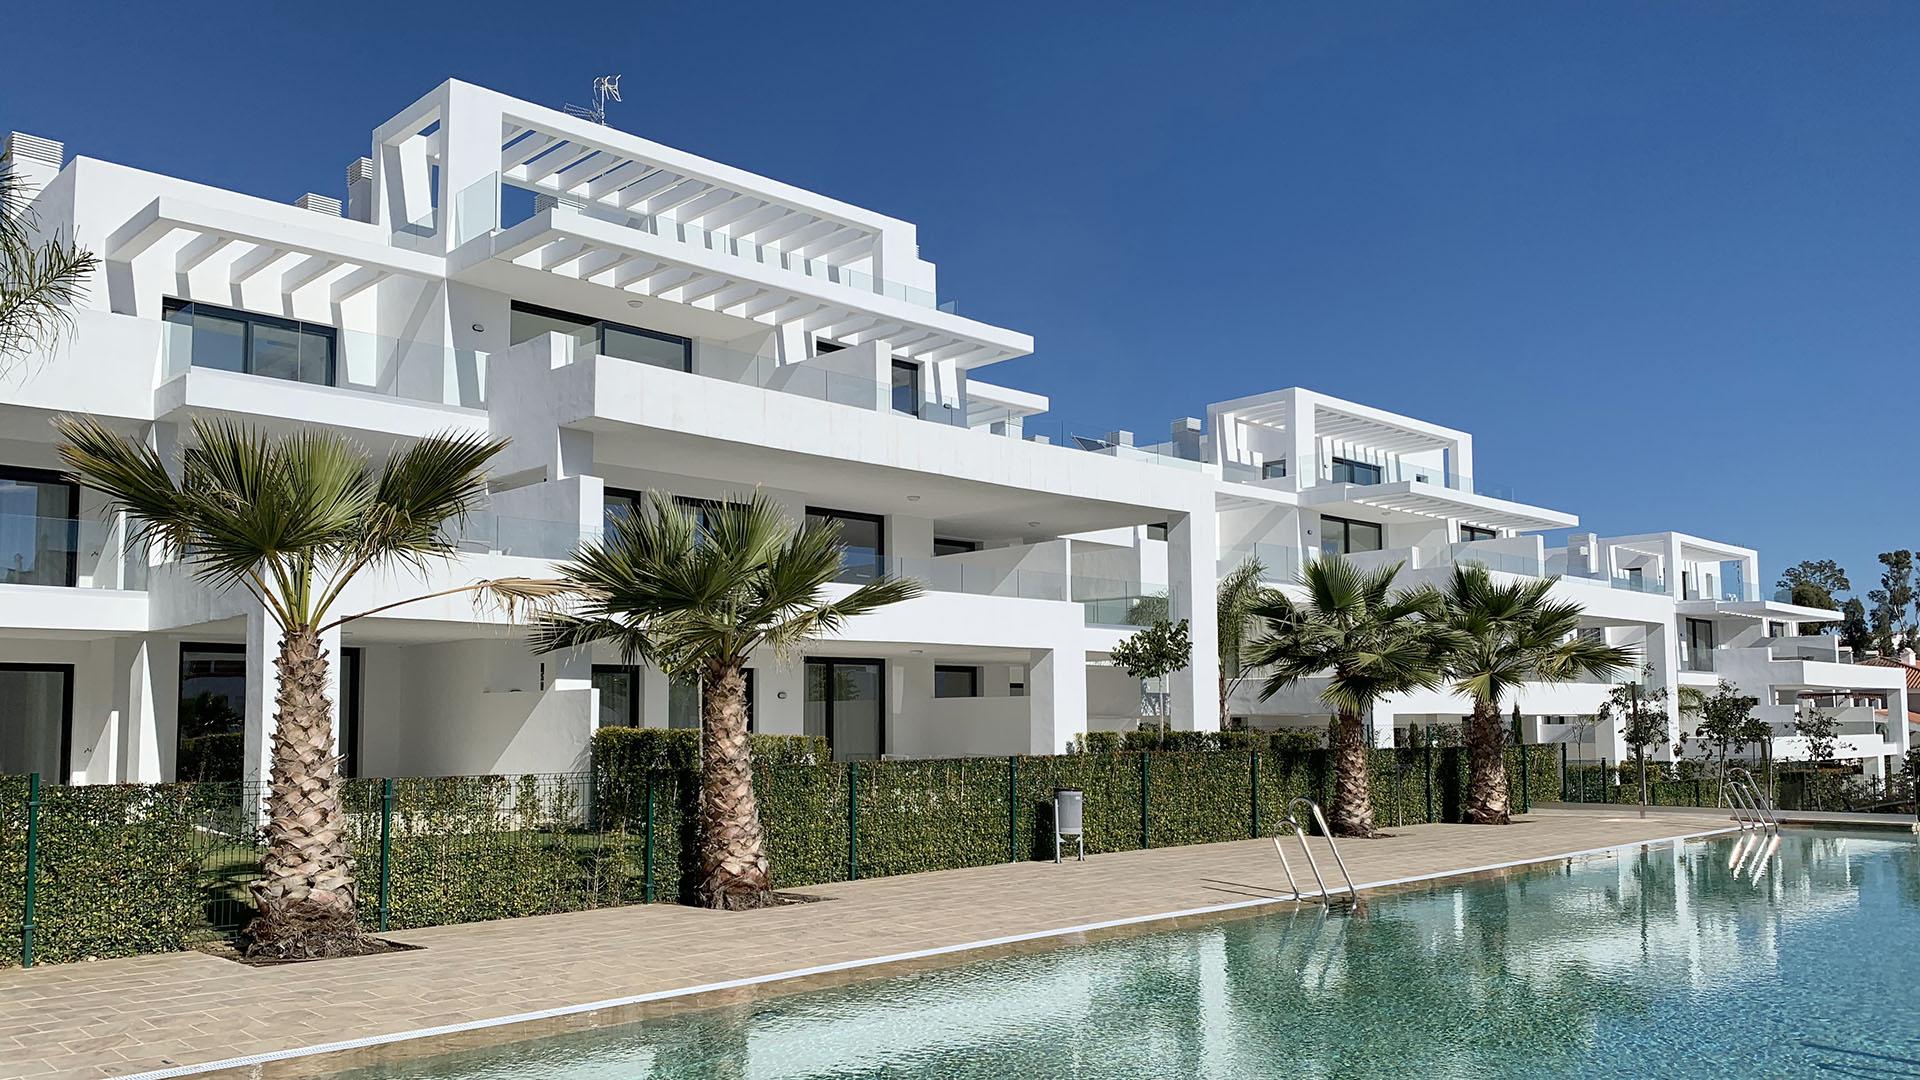 Cortijo del Golf: Contemporary apartments on the New Golden Mile